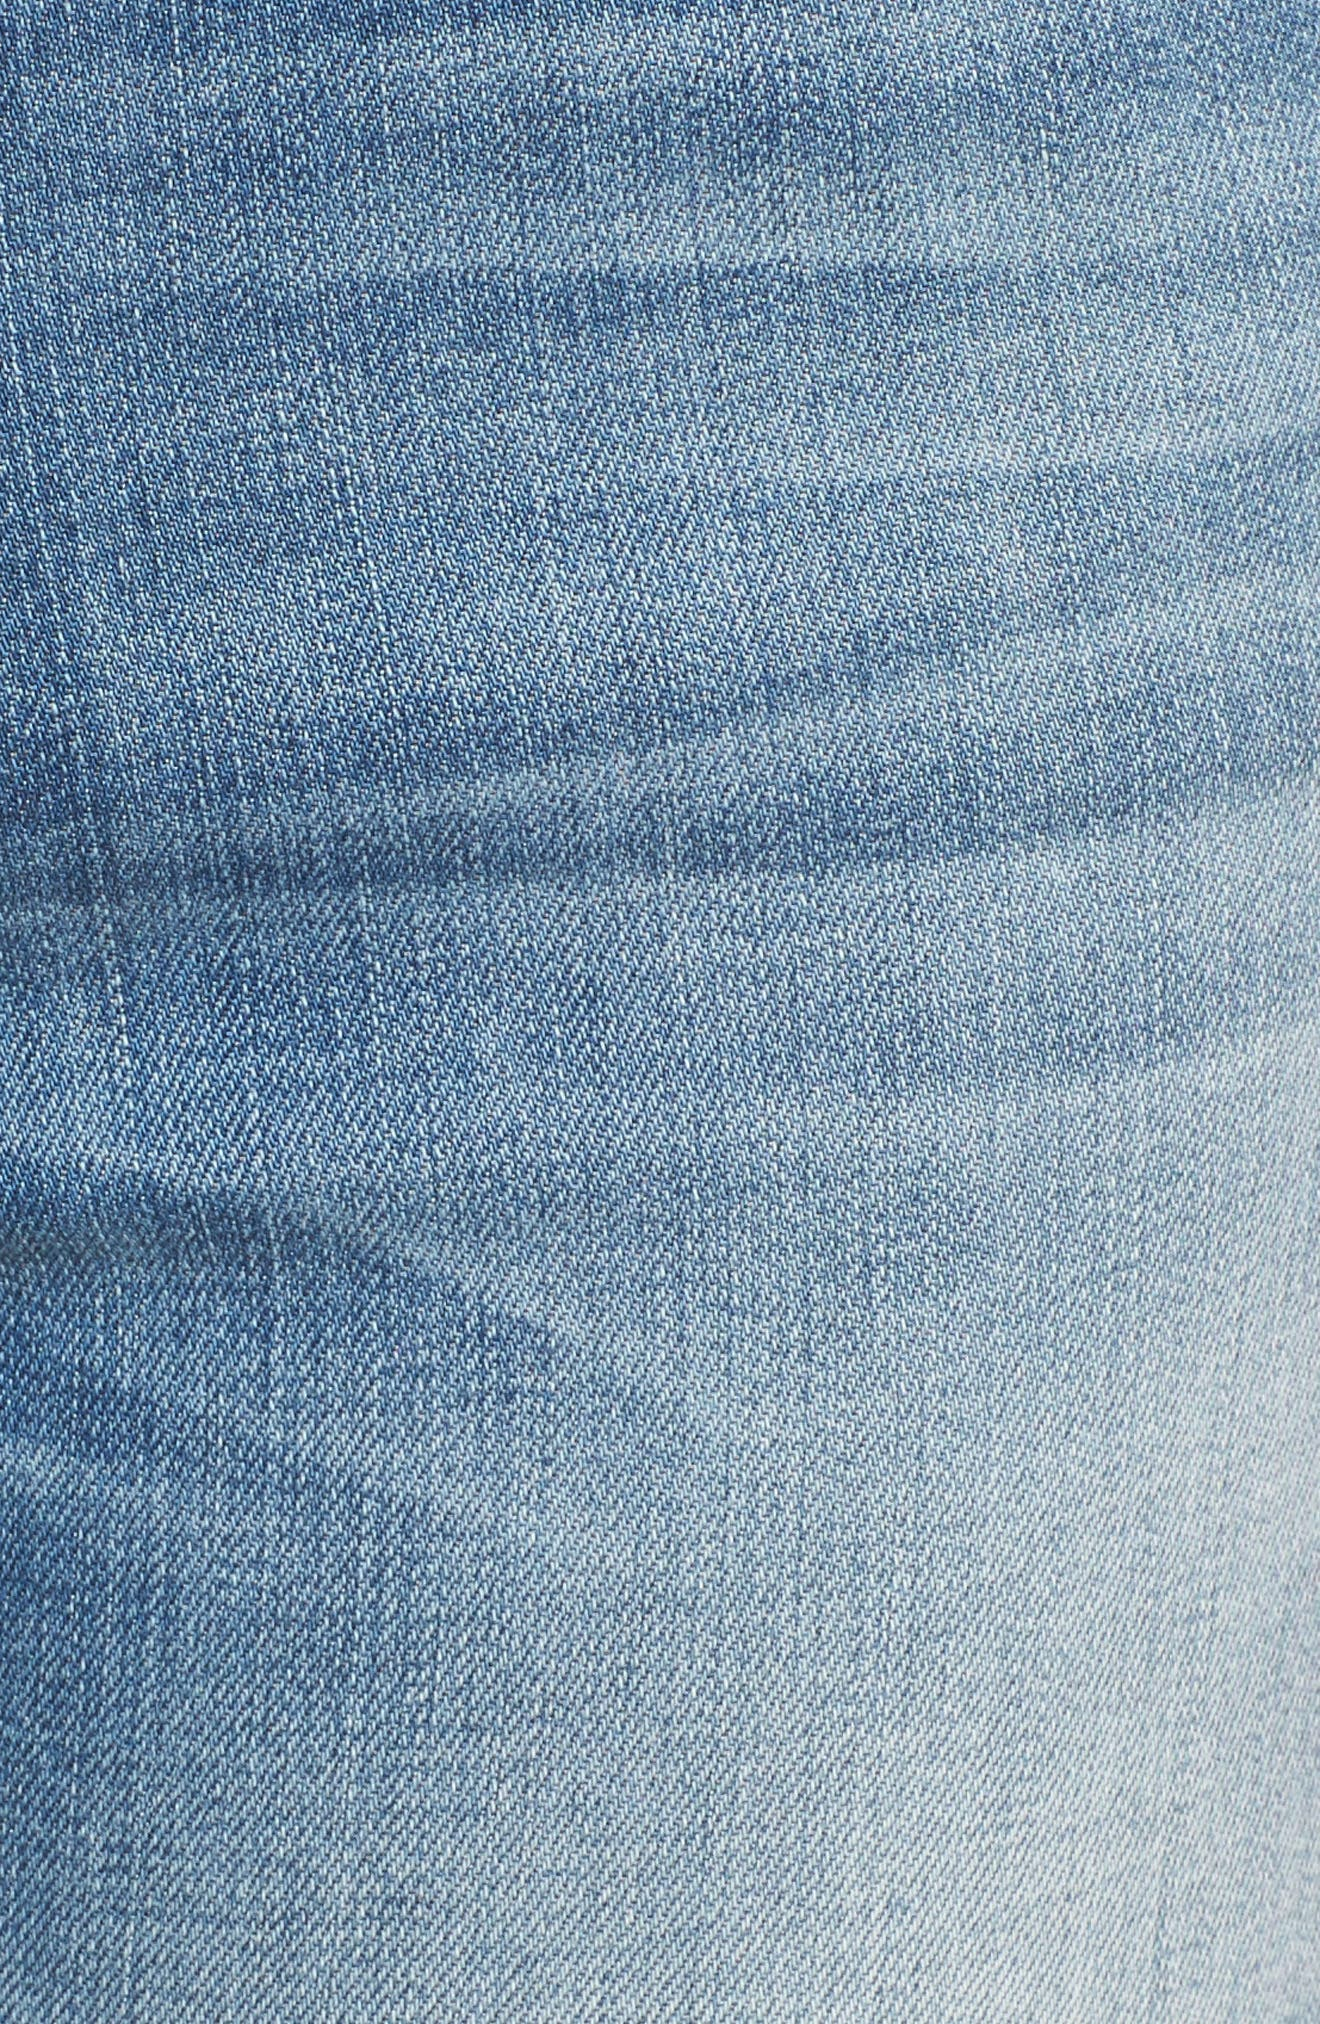 Ellie Ripped High Waist Skinny Jeans,                             Alternate thumbnail 5, color,                             400